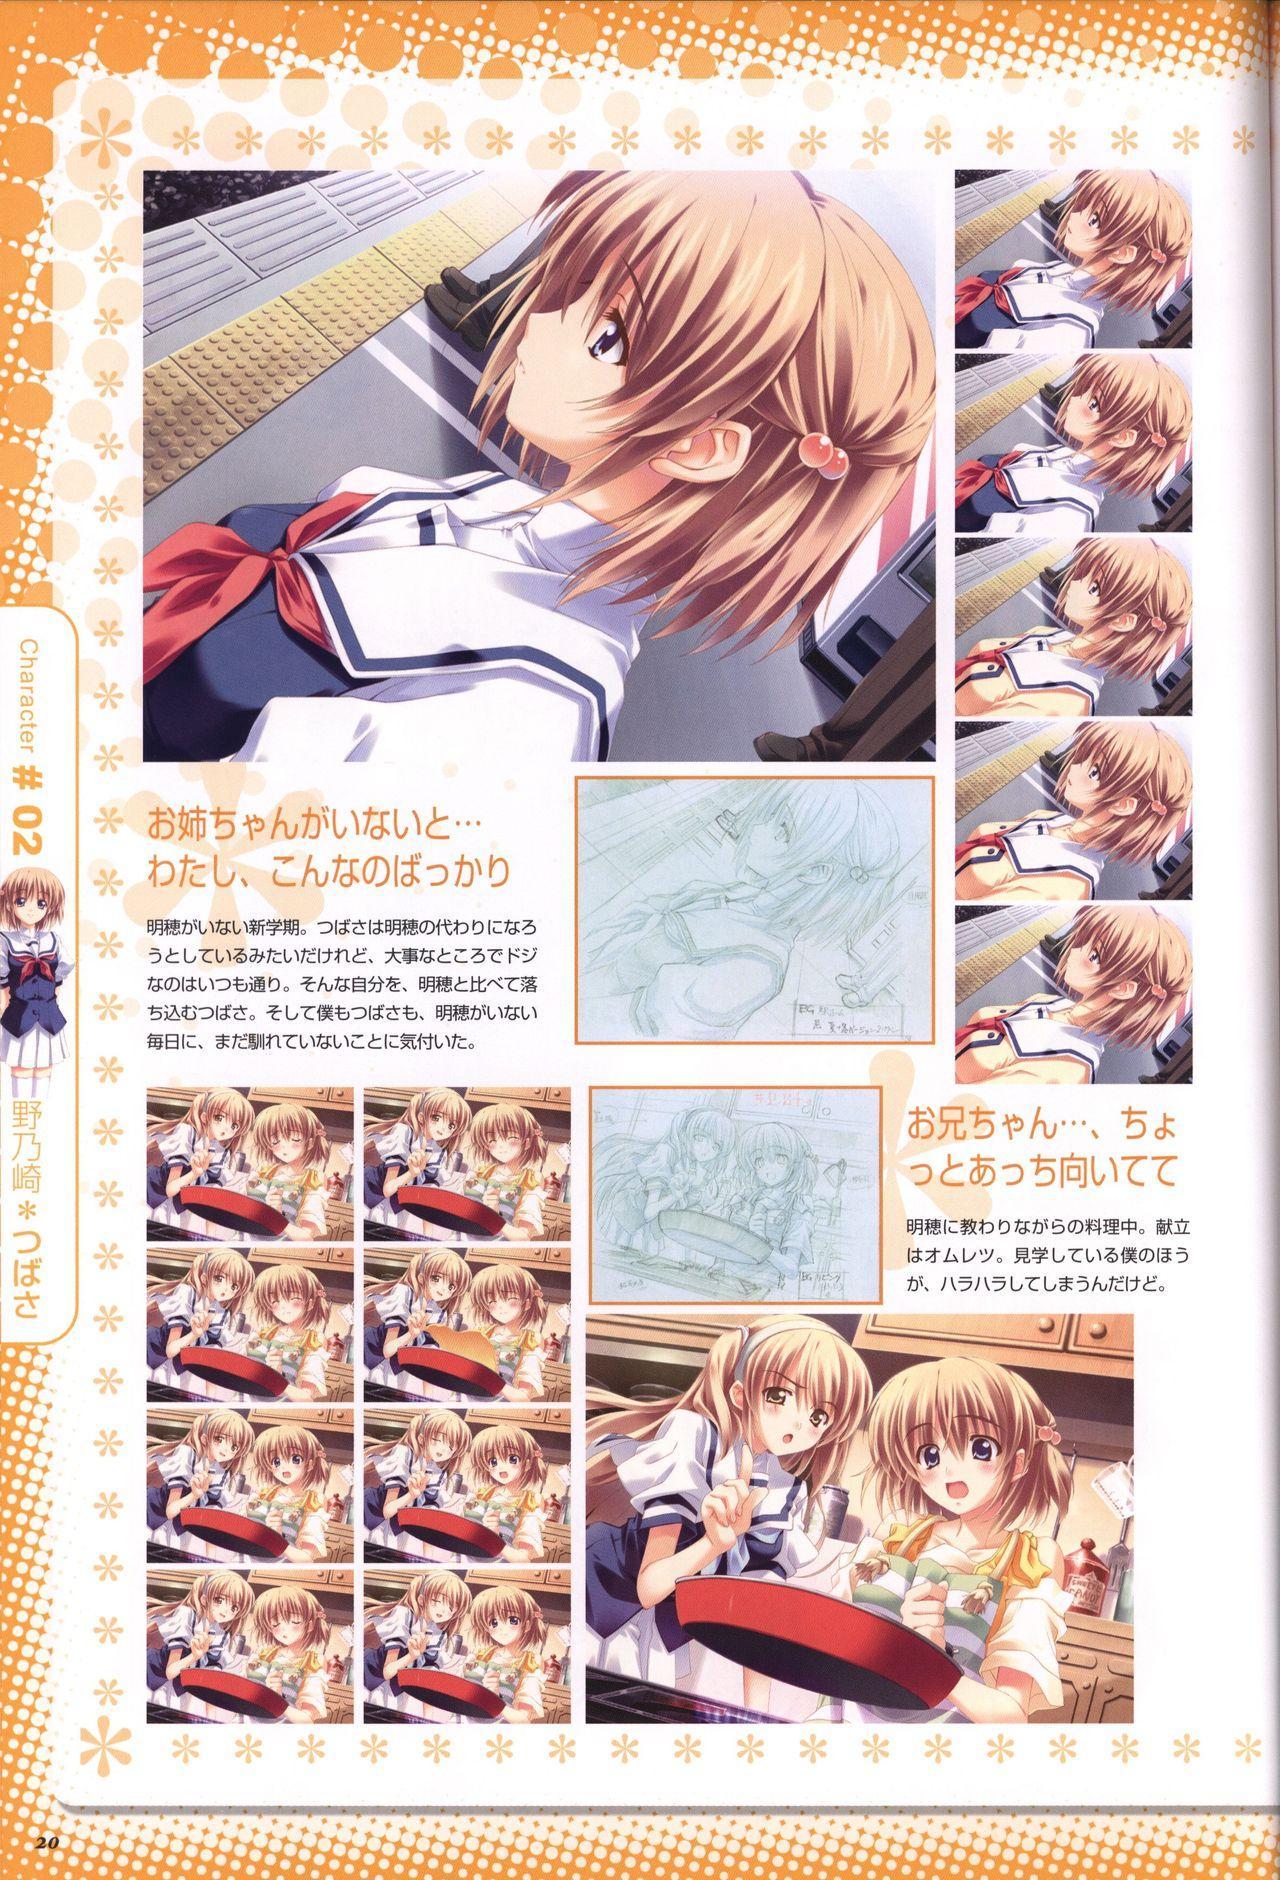 Moshimo Ashita ga Harenaraba official fanbook 20